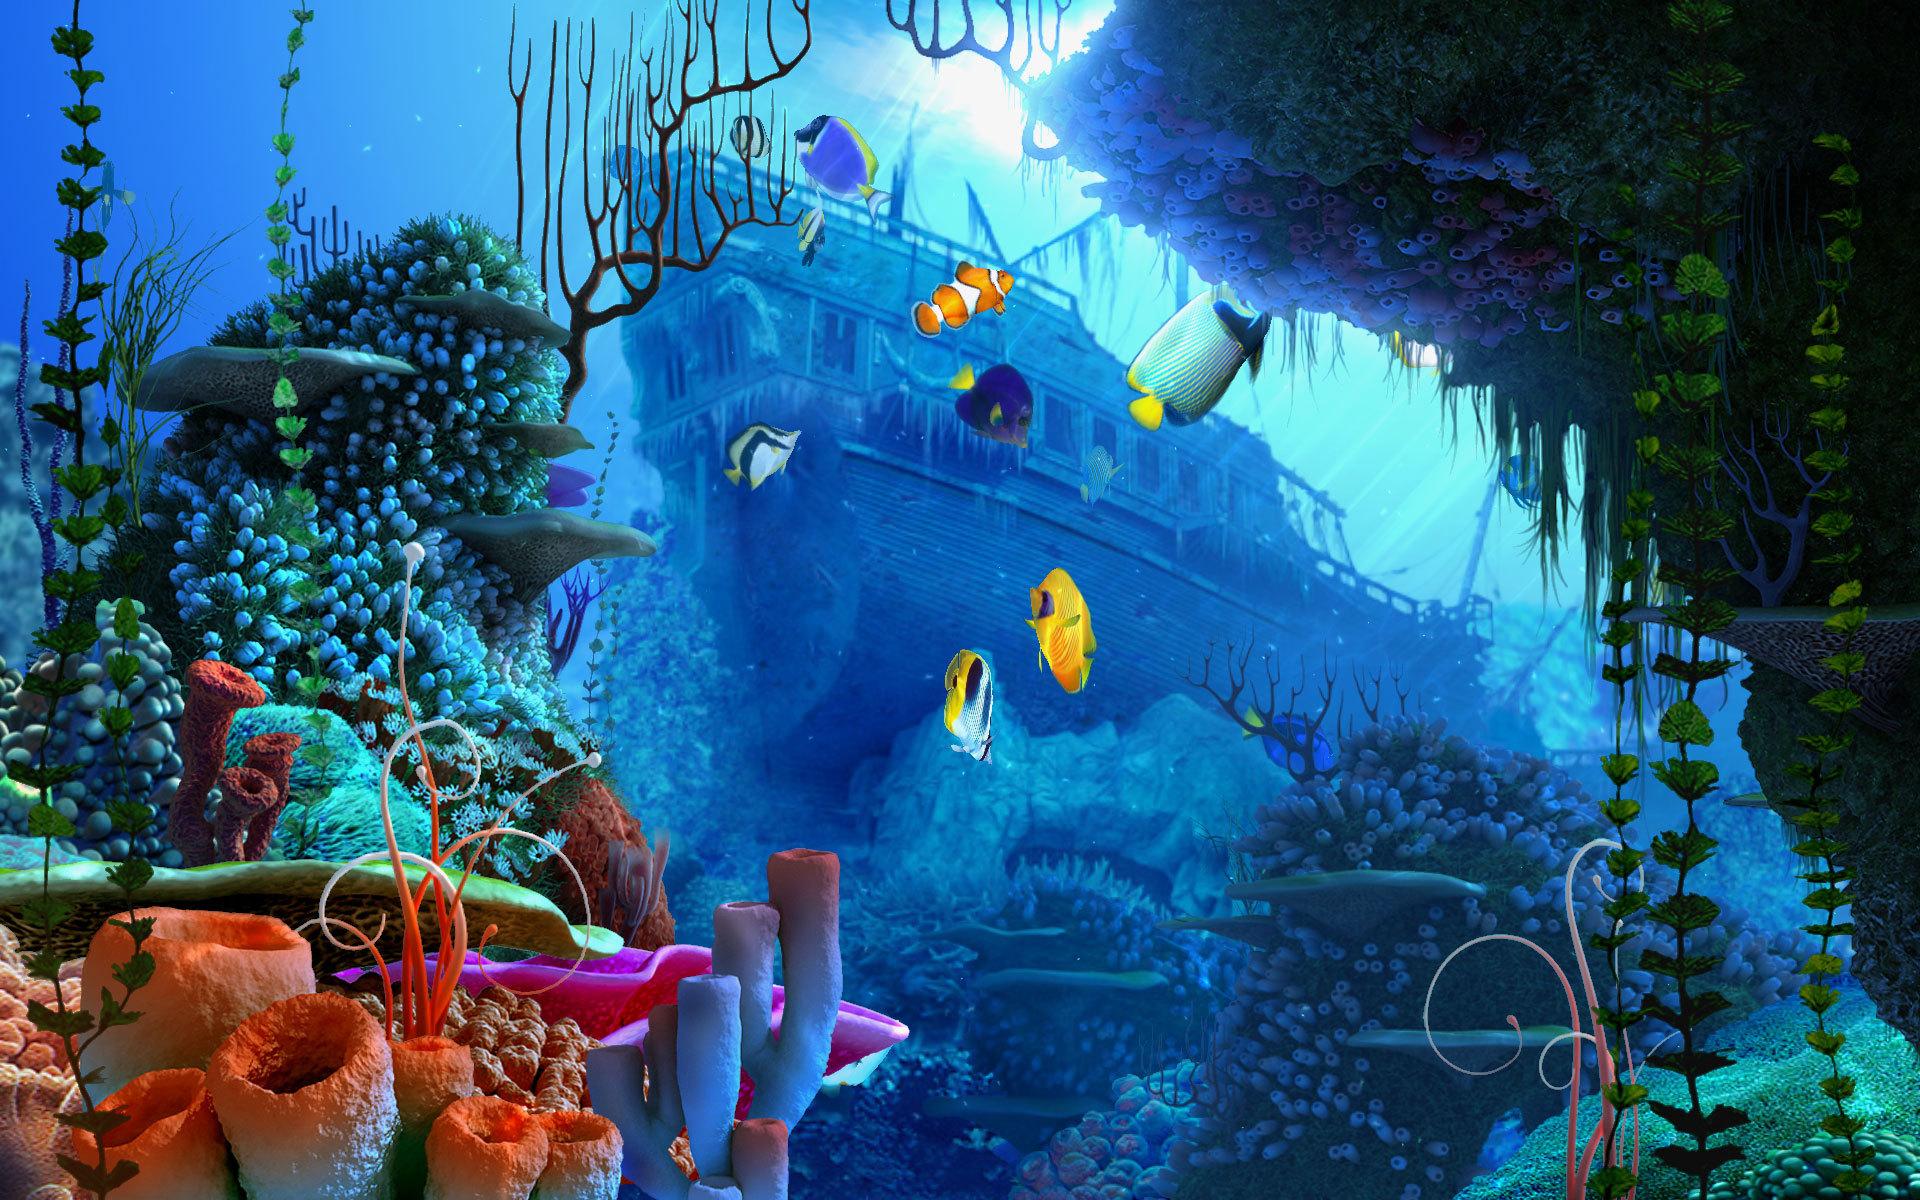 Fish aquarium for windows 7 screensaver - Coral Reef Aquarium 3d Screensaver Vollversion Coral Reef Aquarium